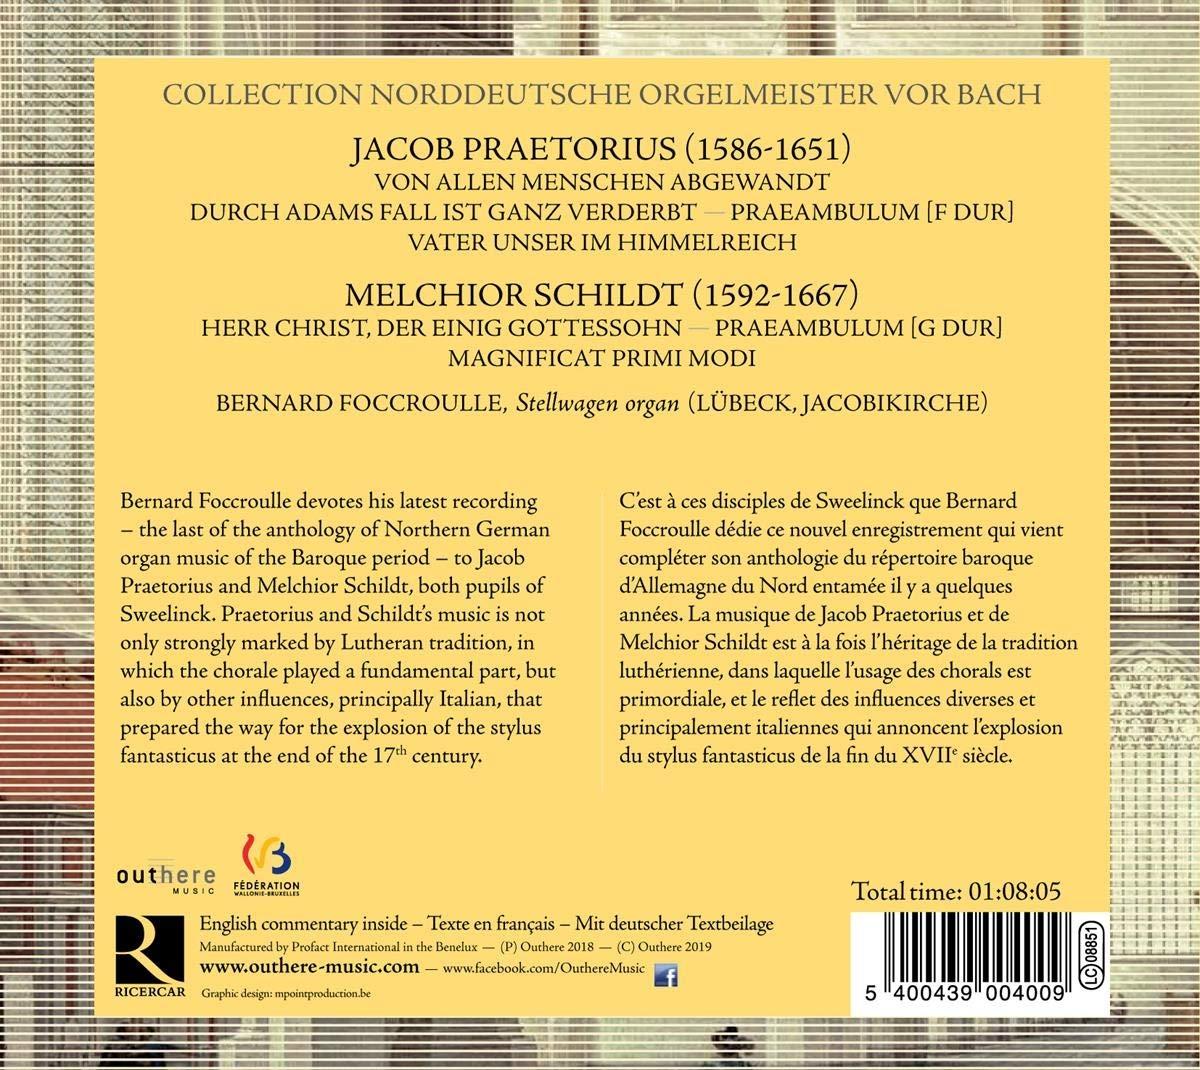 Bernard Foccroulle, Jacob Praetorius, Melchior Childt, __